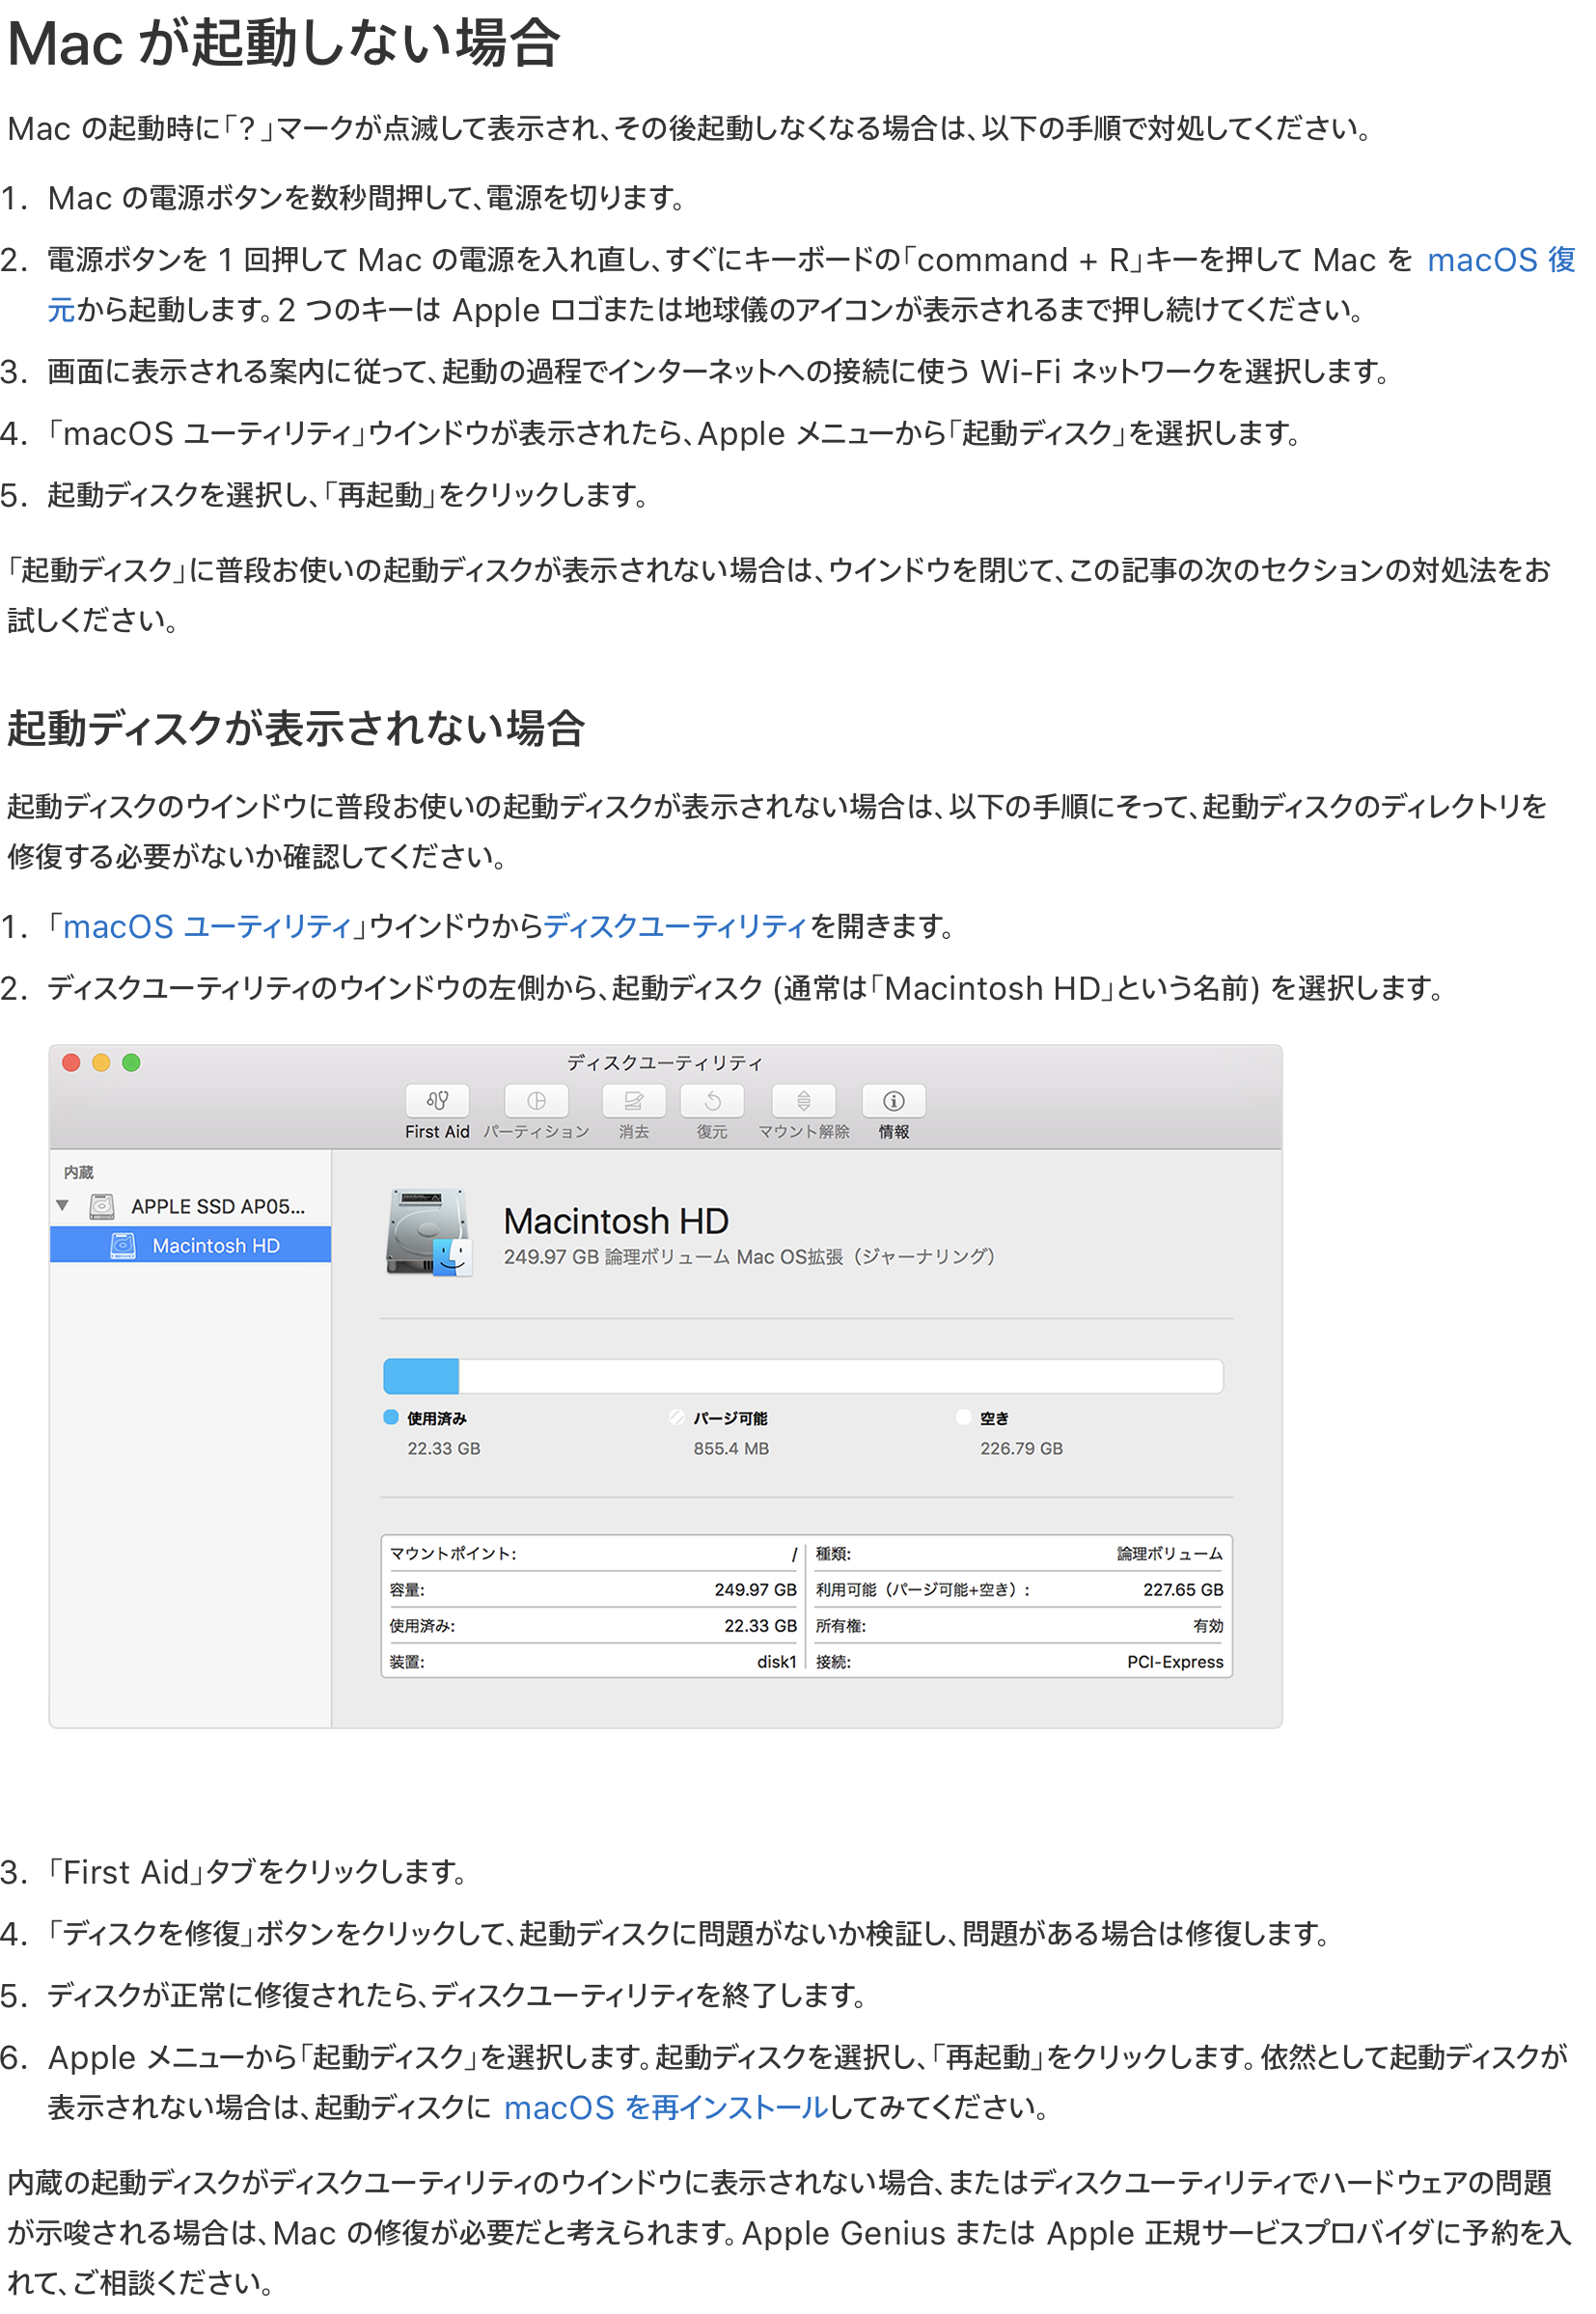 iMacで「?」マーク点滅表示の対処について